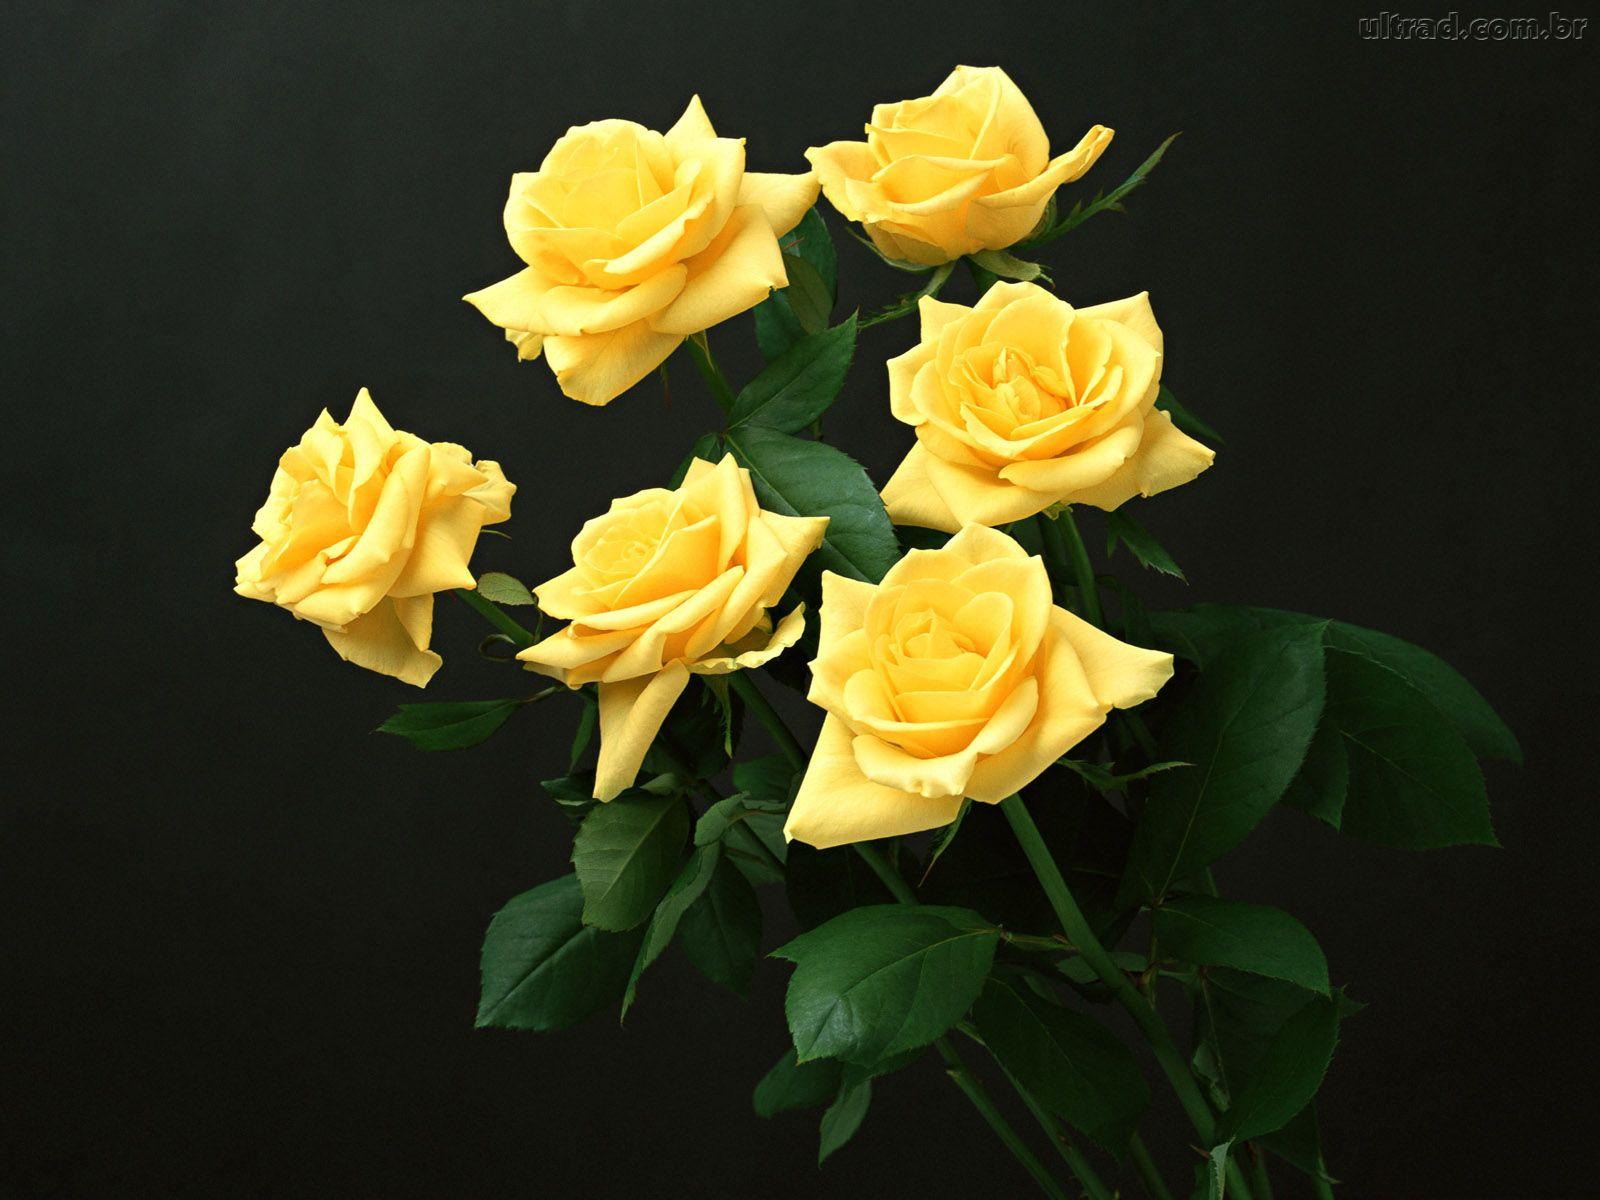 jardim rosas amarelas : jardim rosas amarelas:Coração Tagarela: Setembro 2012